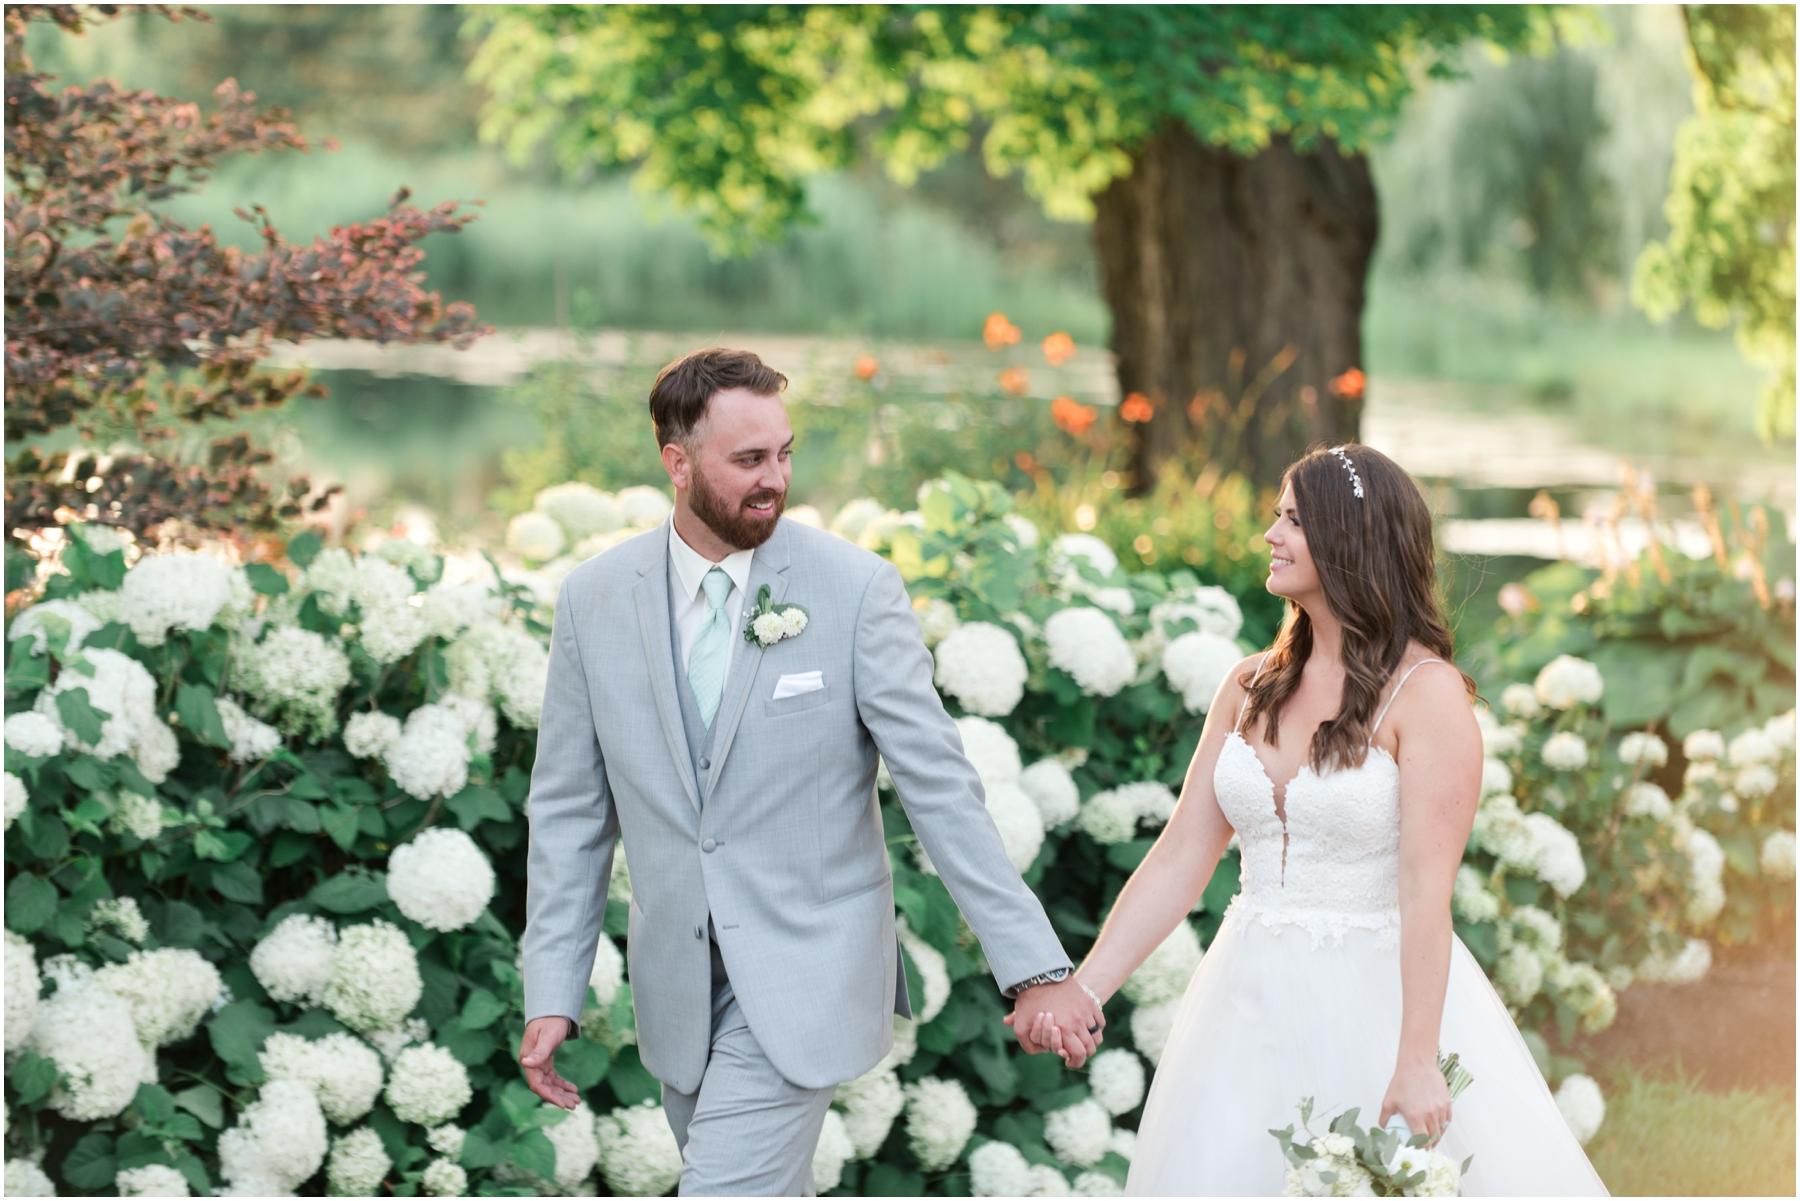 Bloom Field Gardens Wedding Precious Photography_0419